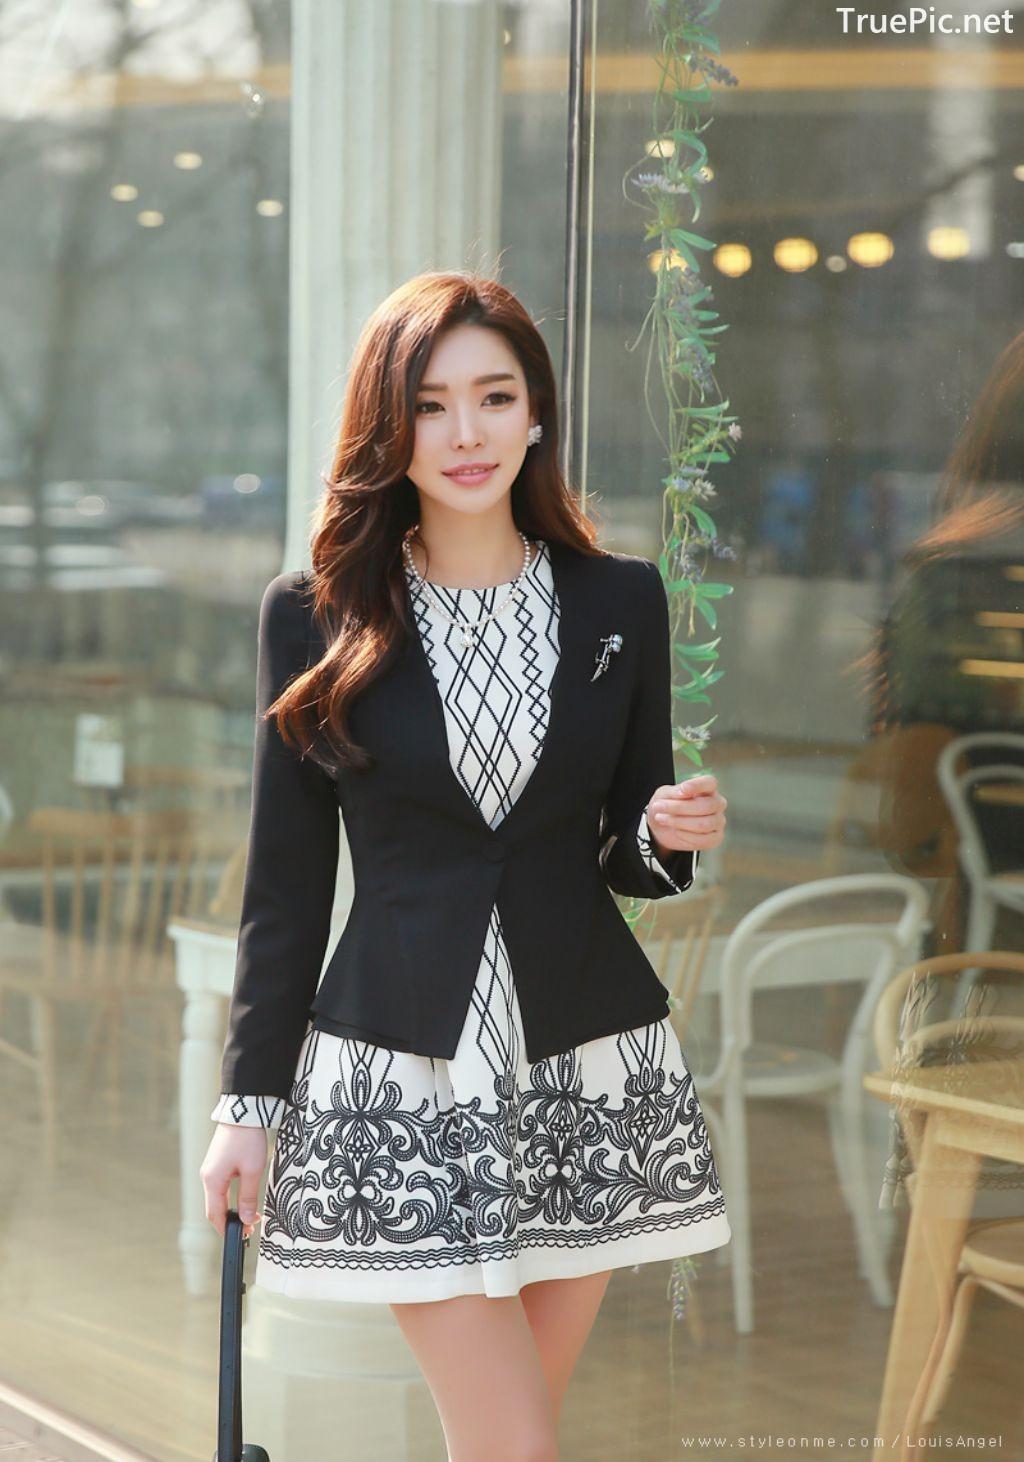 Image-Korean-Fashion-Model-Park-Da-Hyun-Office-Dress-Collection-TruePic.net- Picture-2